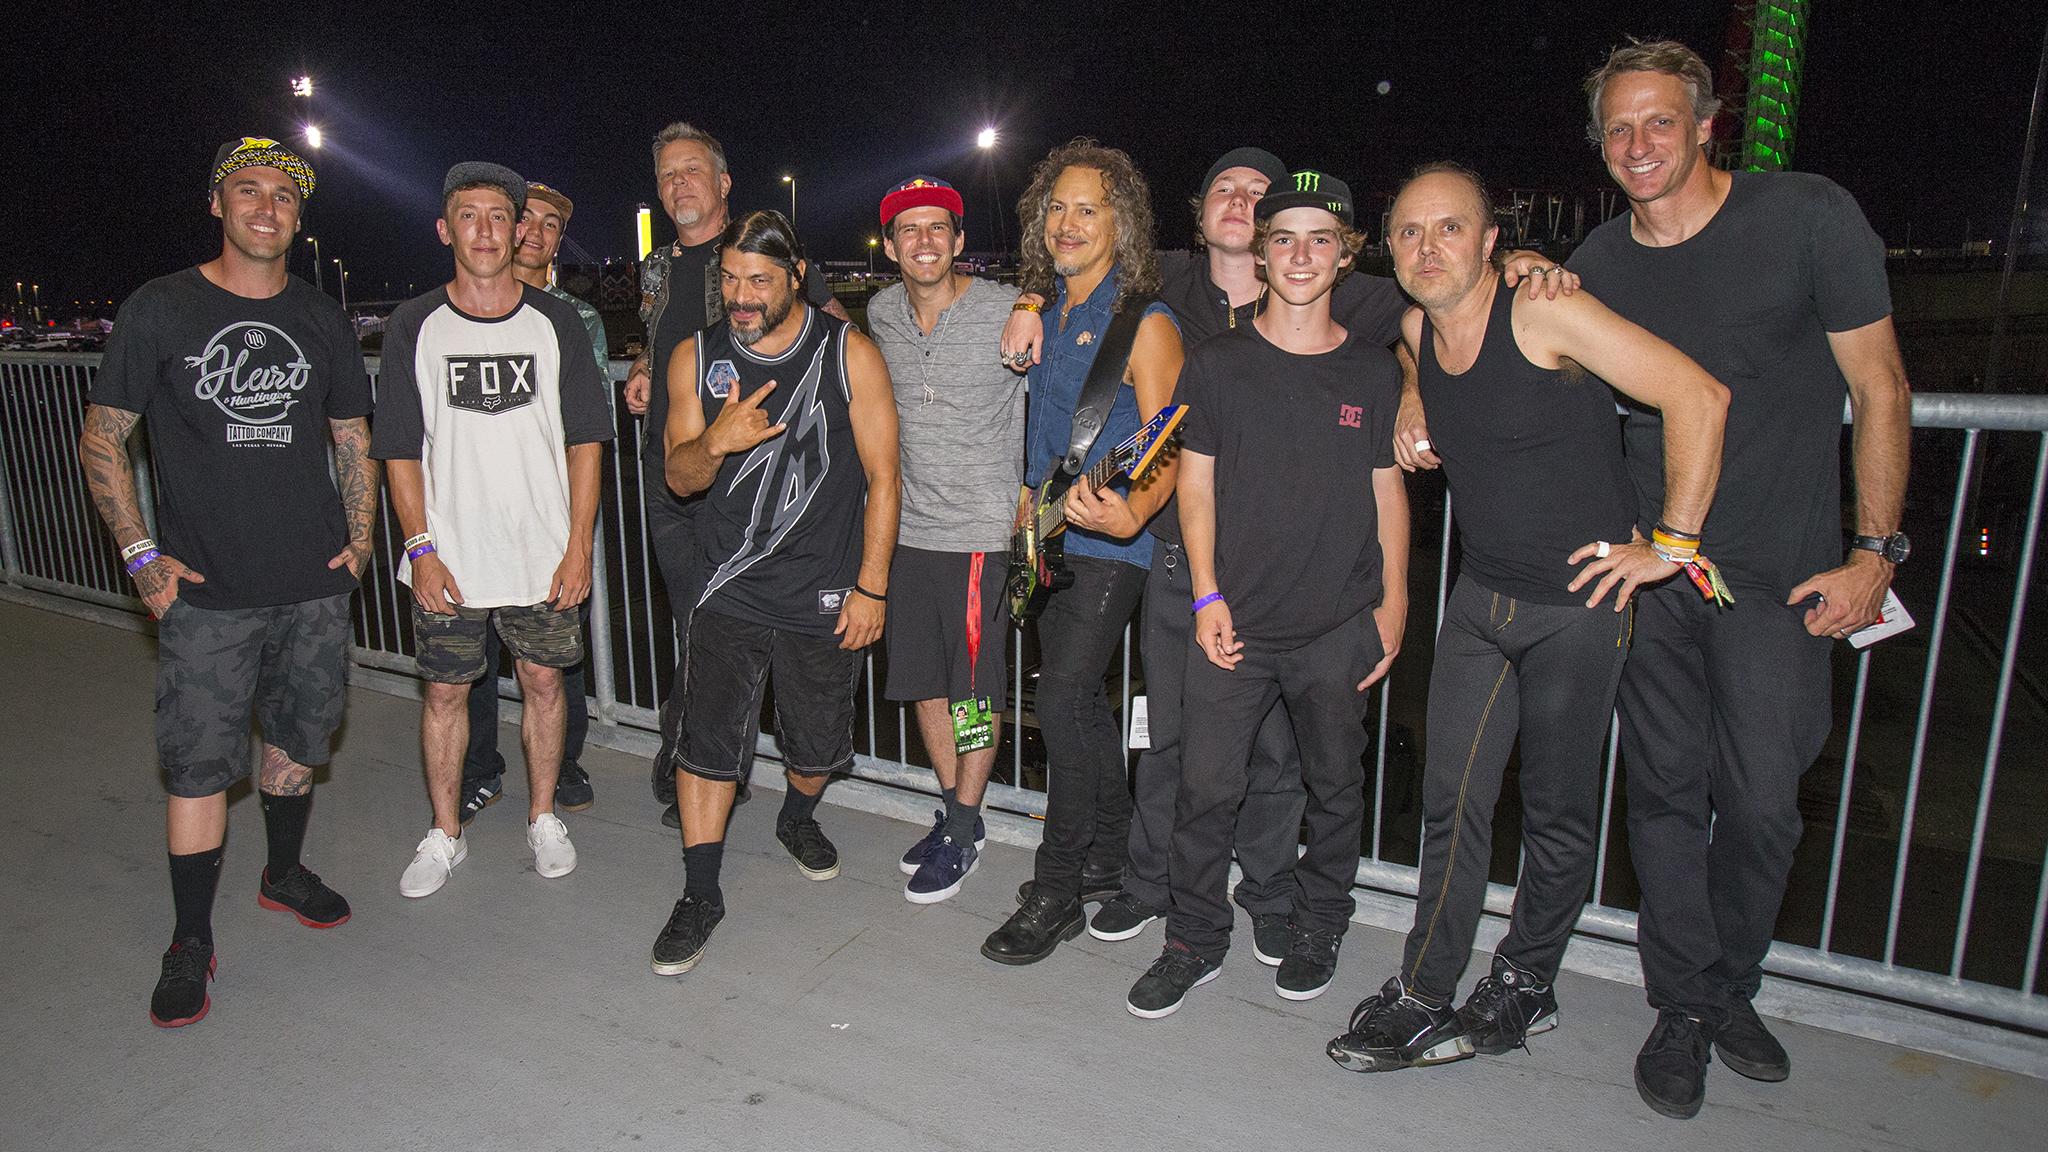 Hawk, Dhers meet Metallica